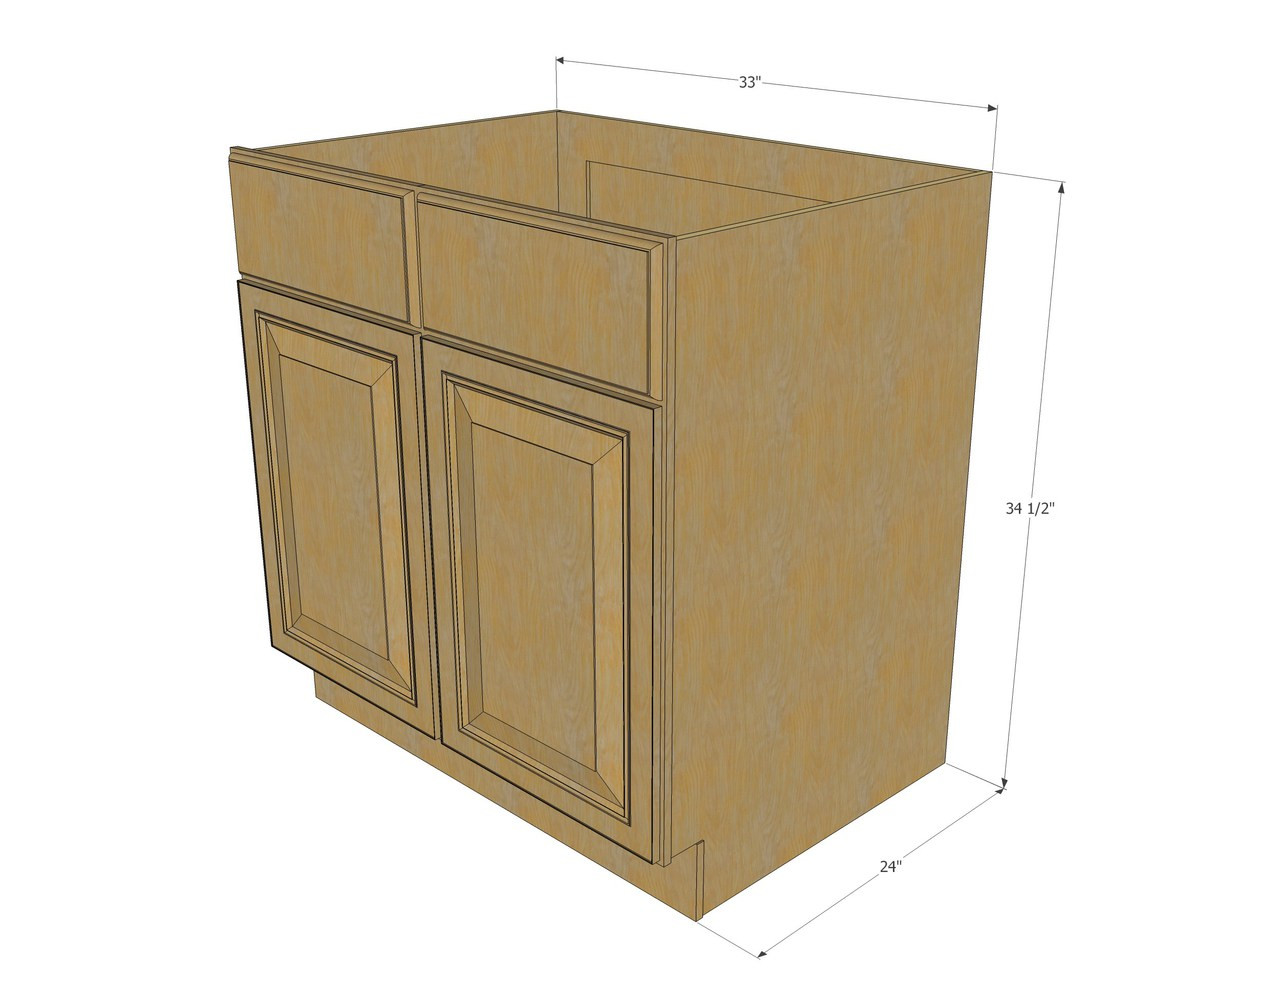 Regal oak sink base unit with 2 false drawers 33 inch for Oak kitchen base units